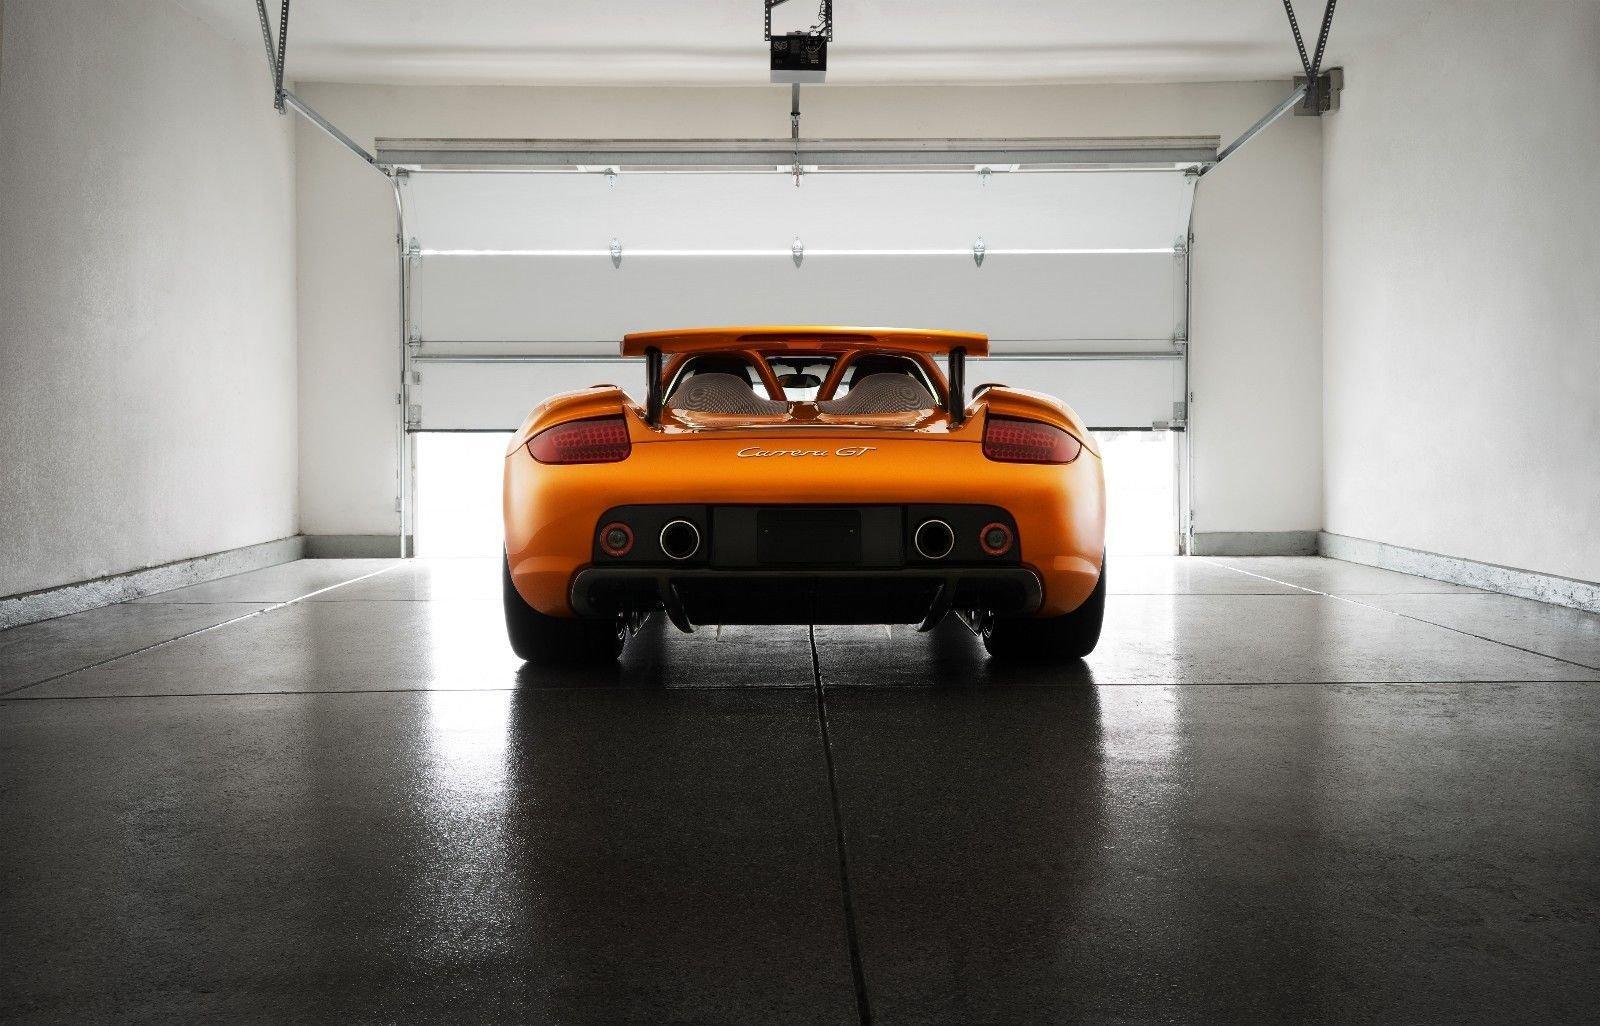 Porsche_Carrera_GT_Αrancio_Βorealis_0002